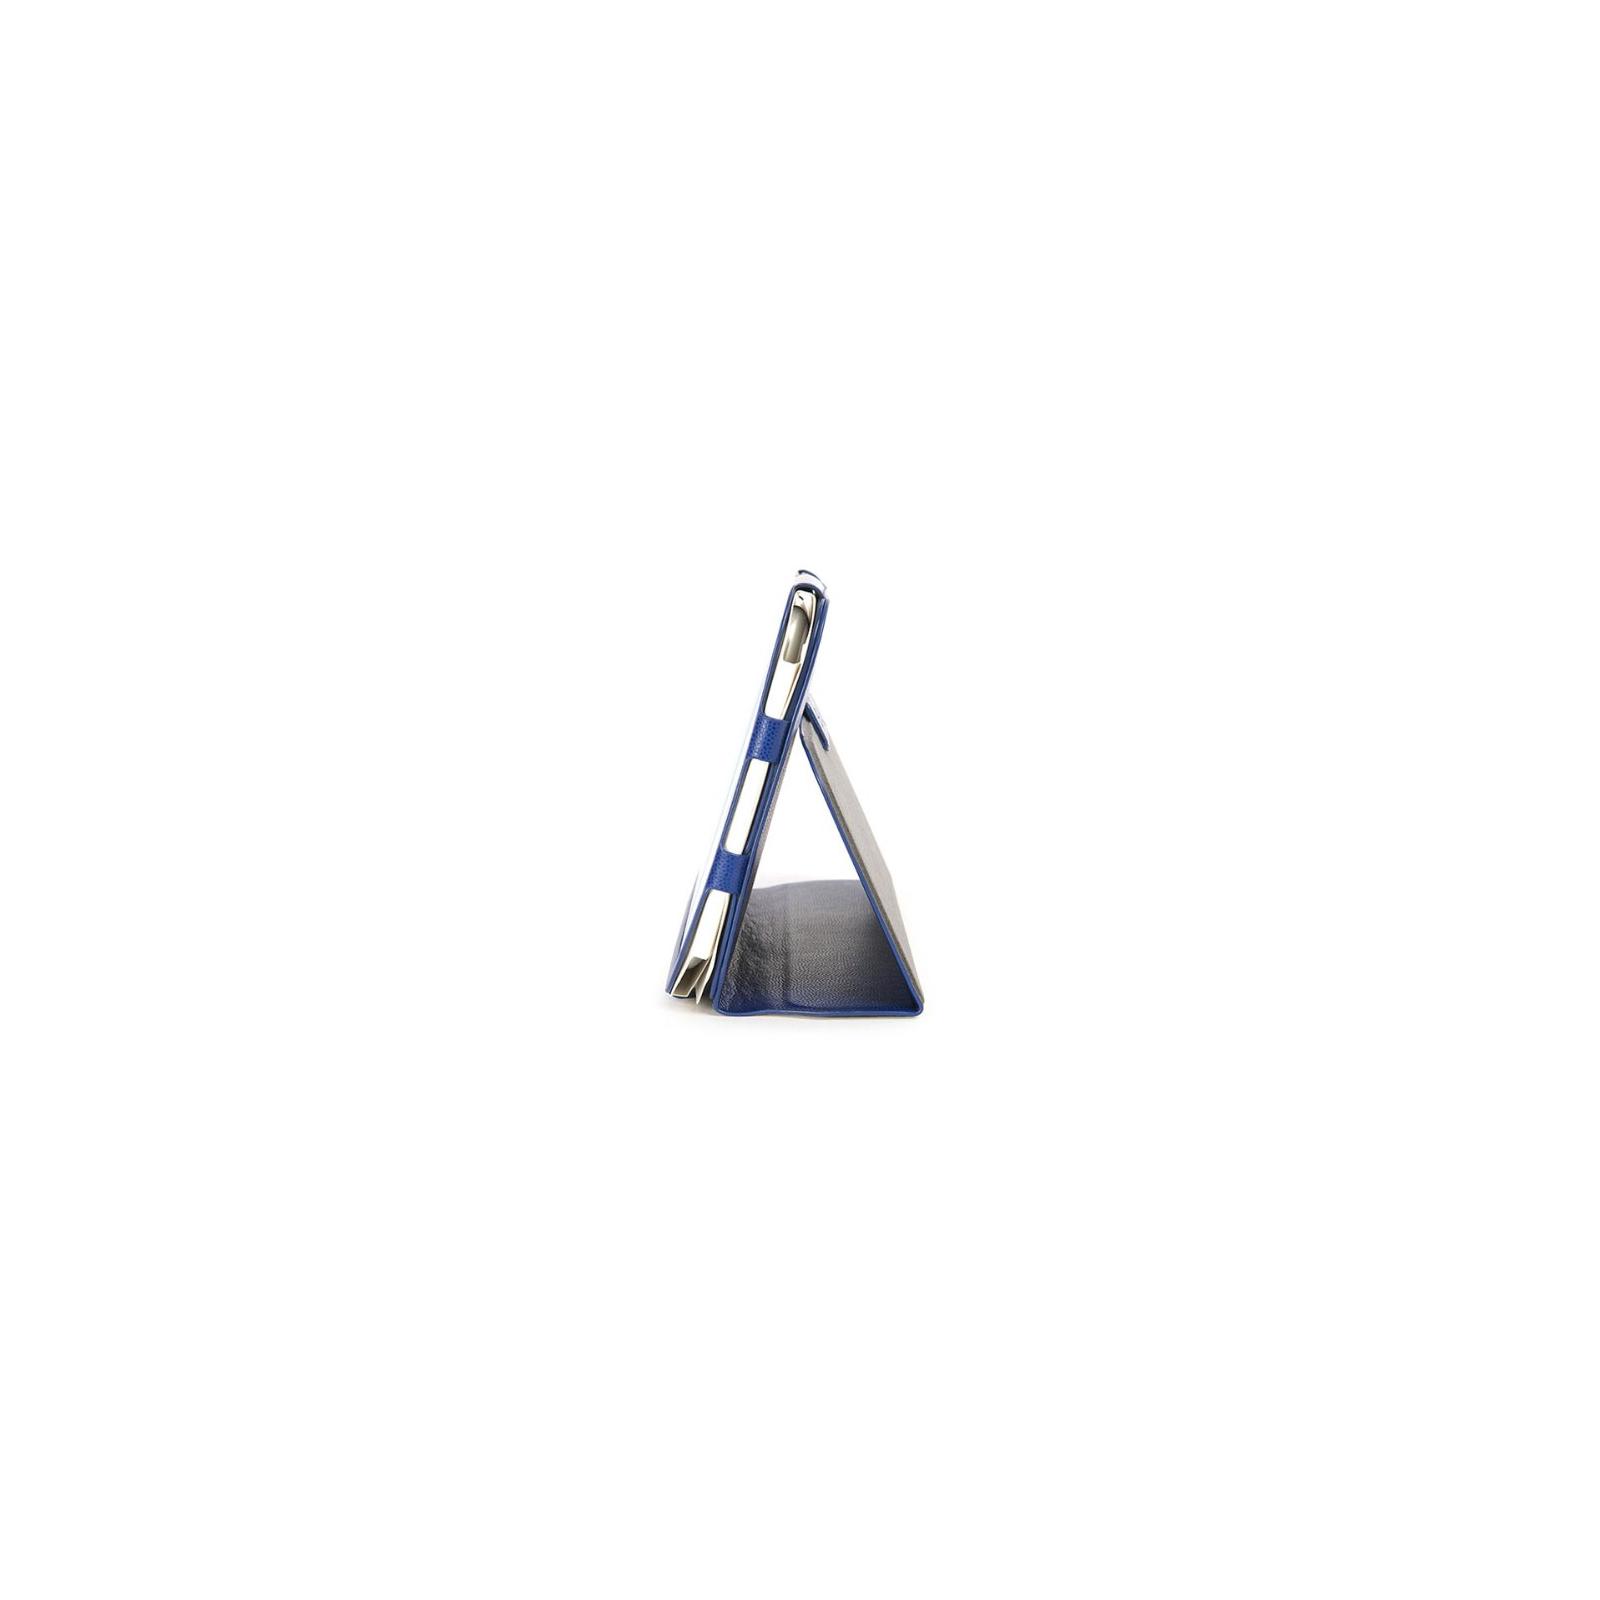 Чехол для планшета Tucano Galaxy Tab 3 8.0 Leggero Blue (TAB-LS38-B) изображение 4